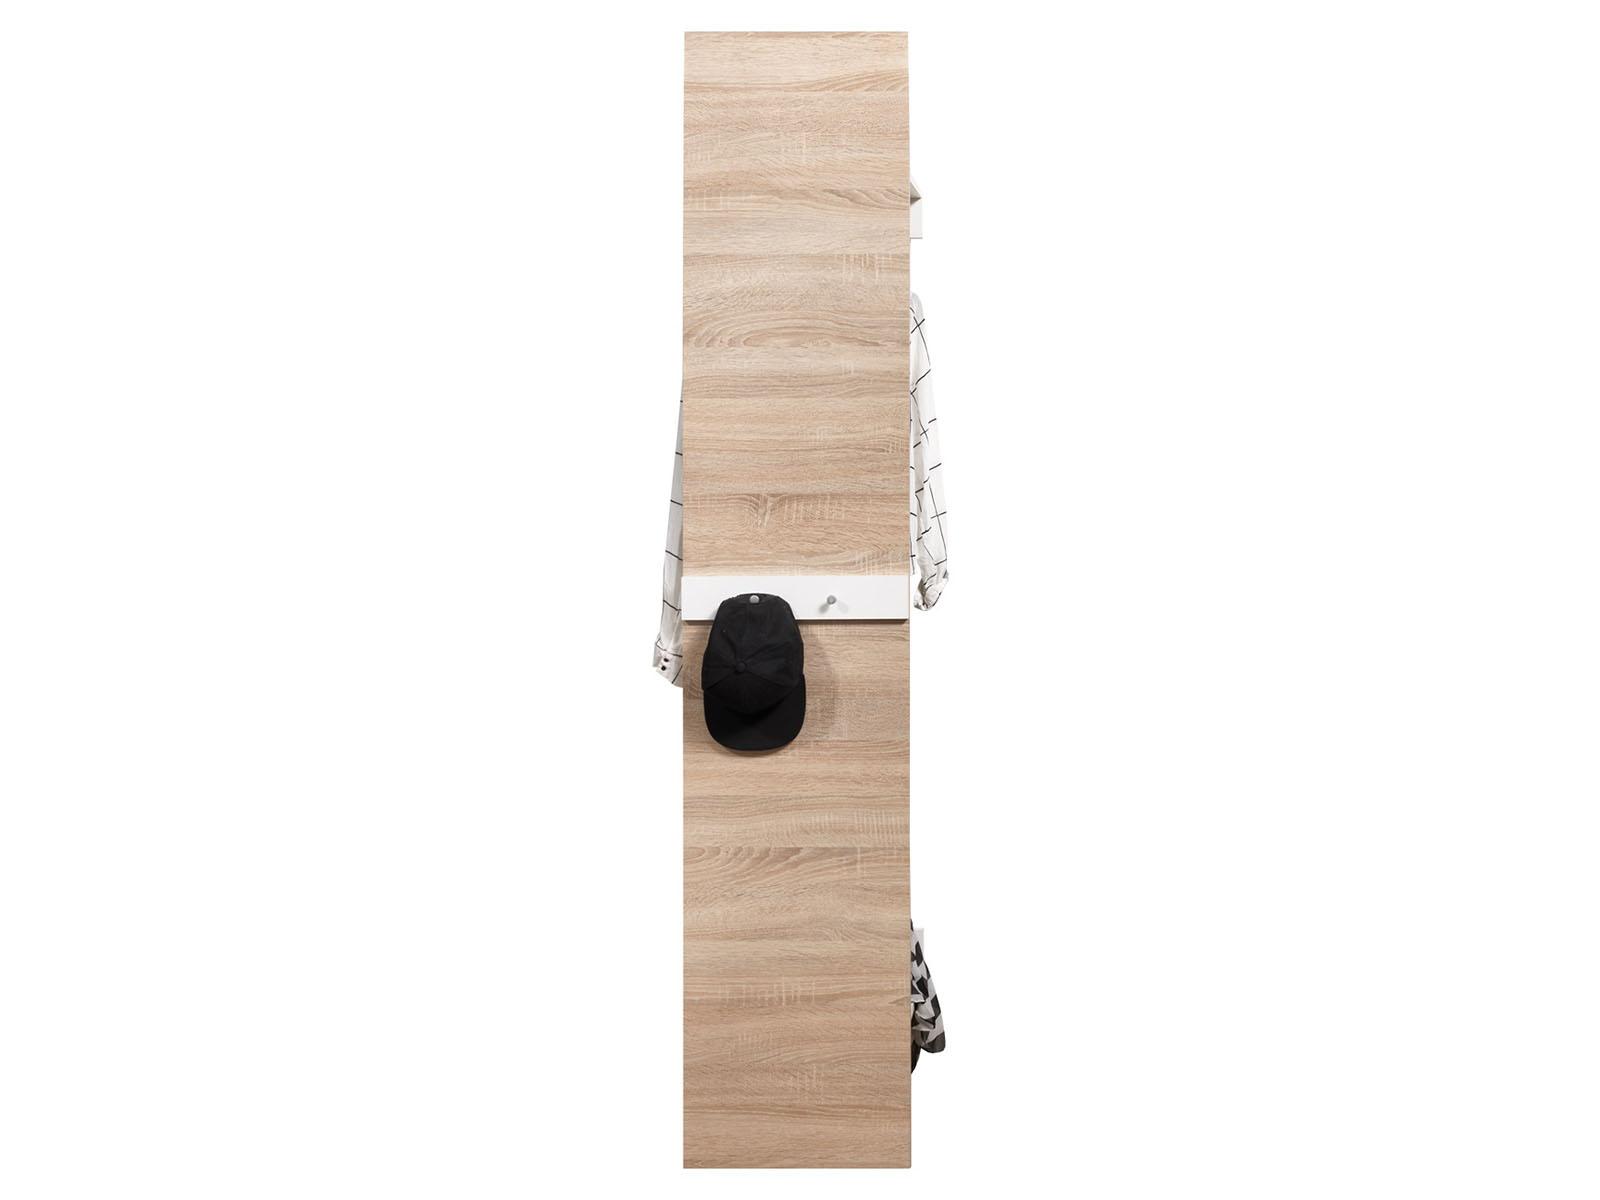 garderobe flurgarderobe komplett set h ngegarderobe othilie i wei eiche ebay. Black Bedroom Furniture Sets. Home Design Ideas